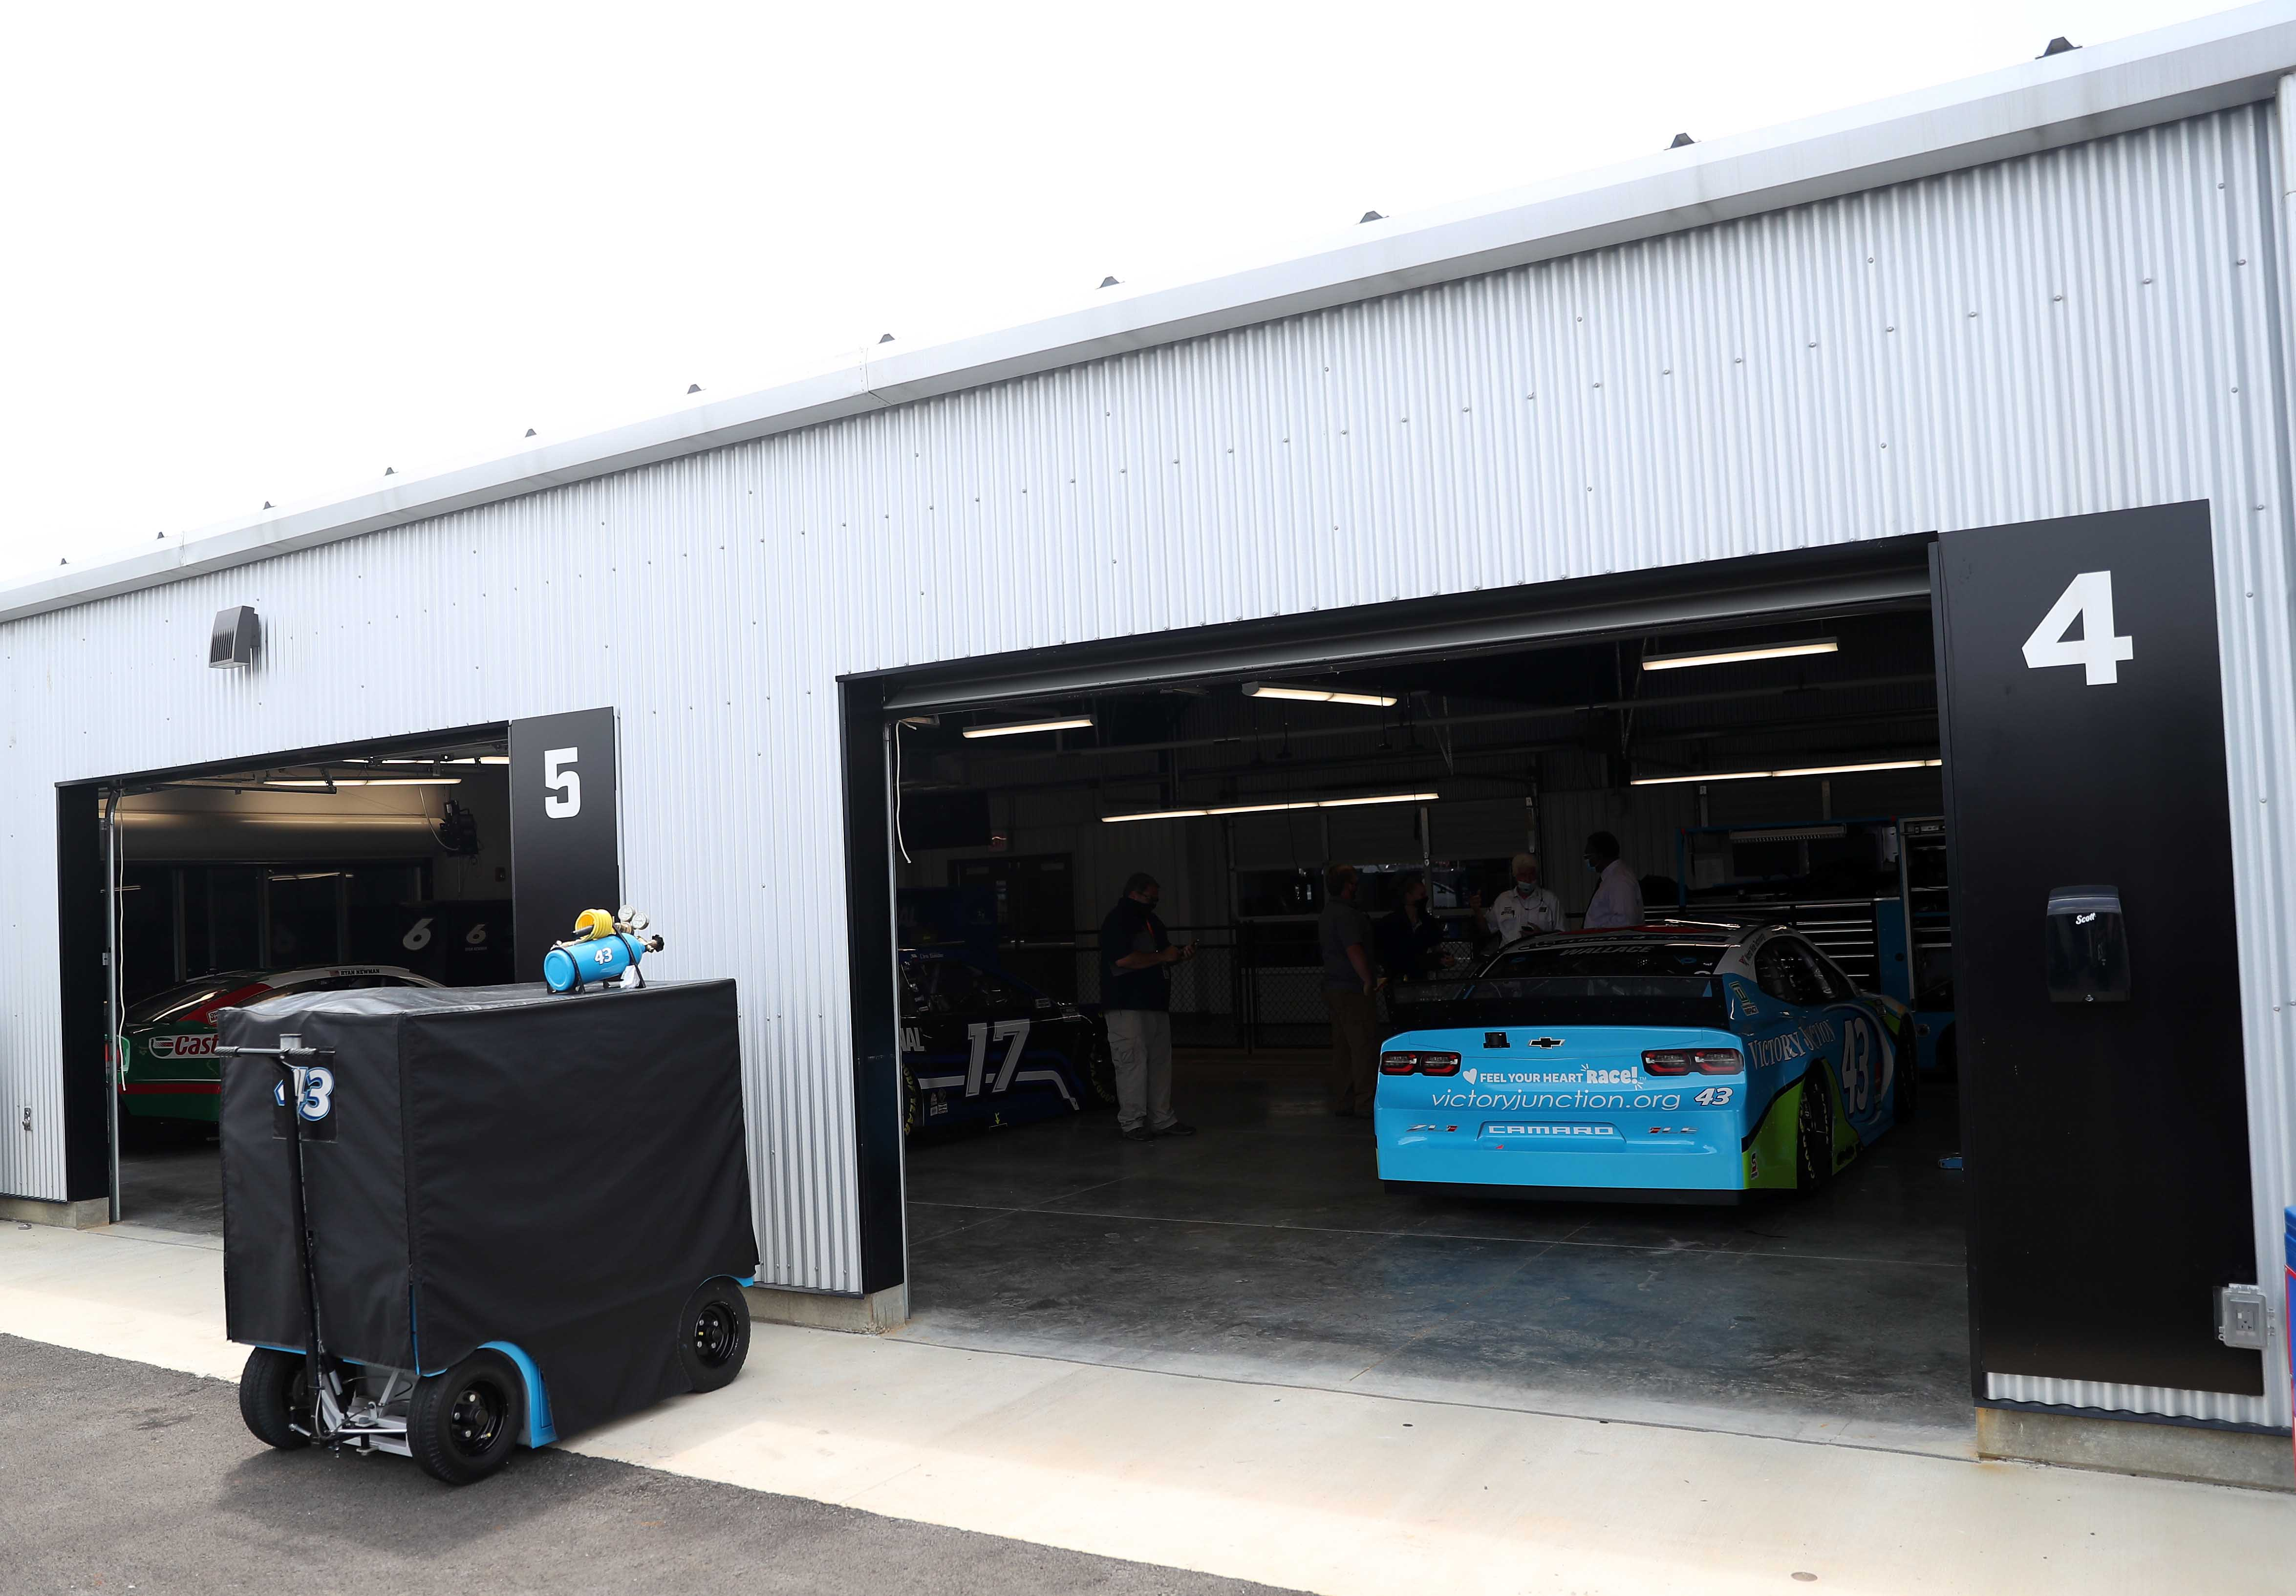 Bubba Wallace - NASCAR garage area at Talladega Superspeedway - NASCAR Cup Series